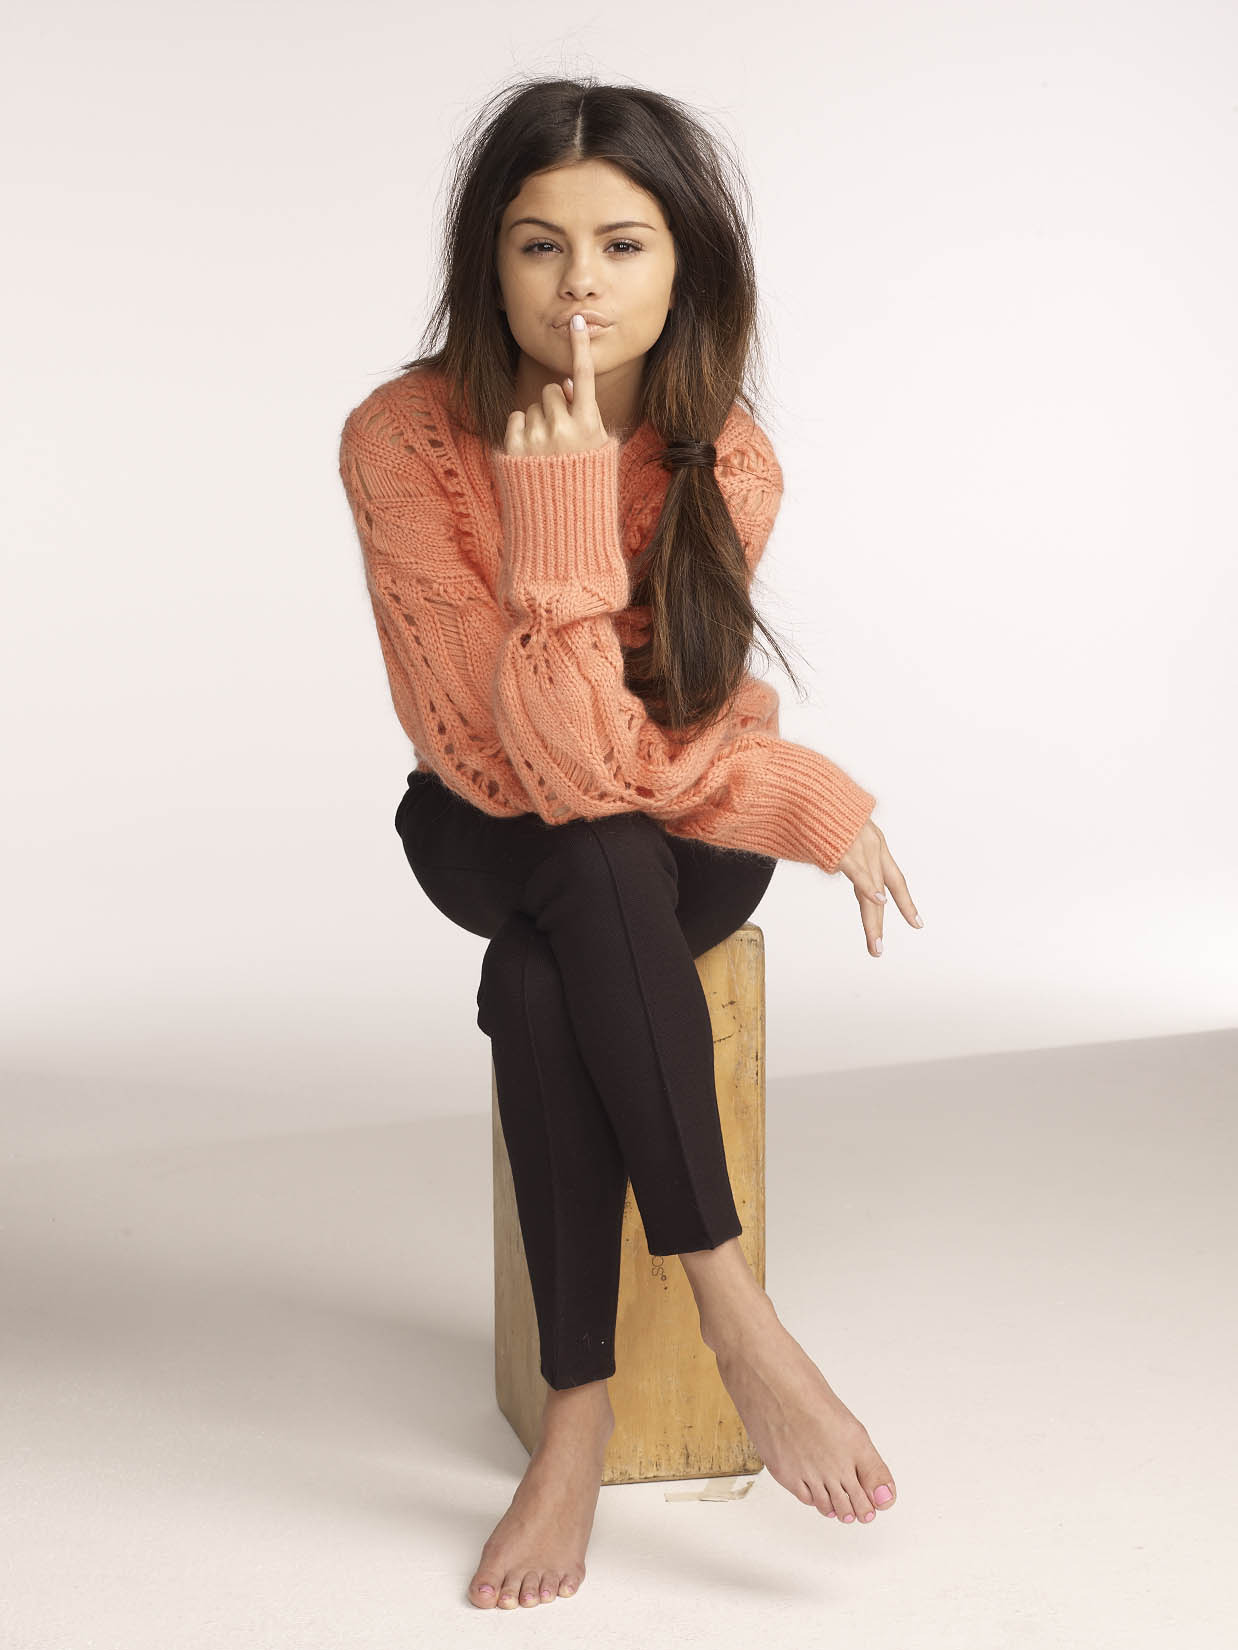 Pin By Selena Gomez On Selena Gomez Feet Pinterest